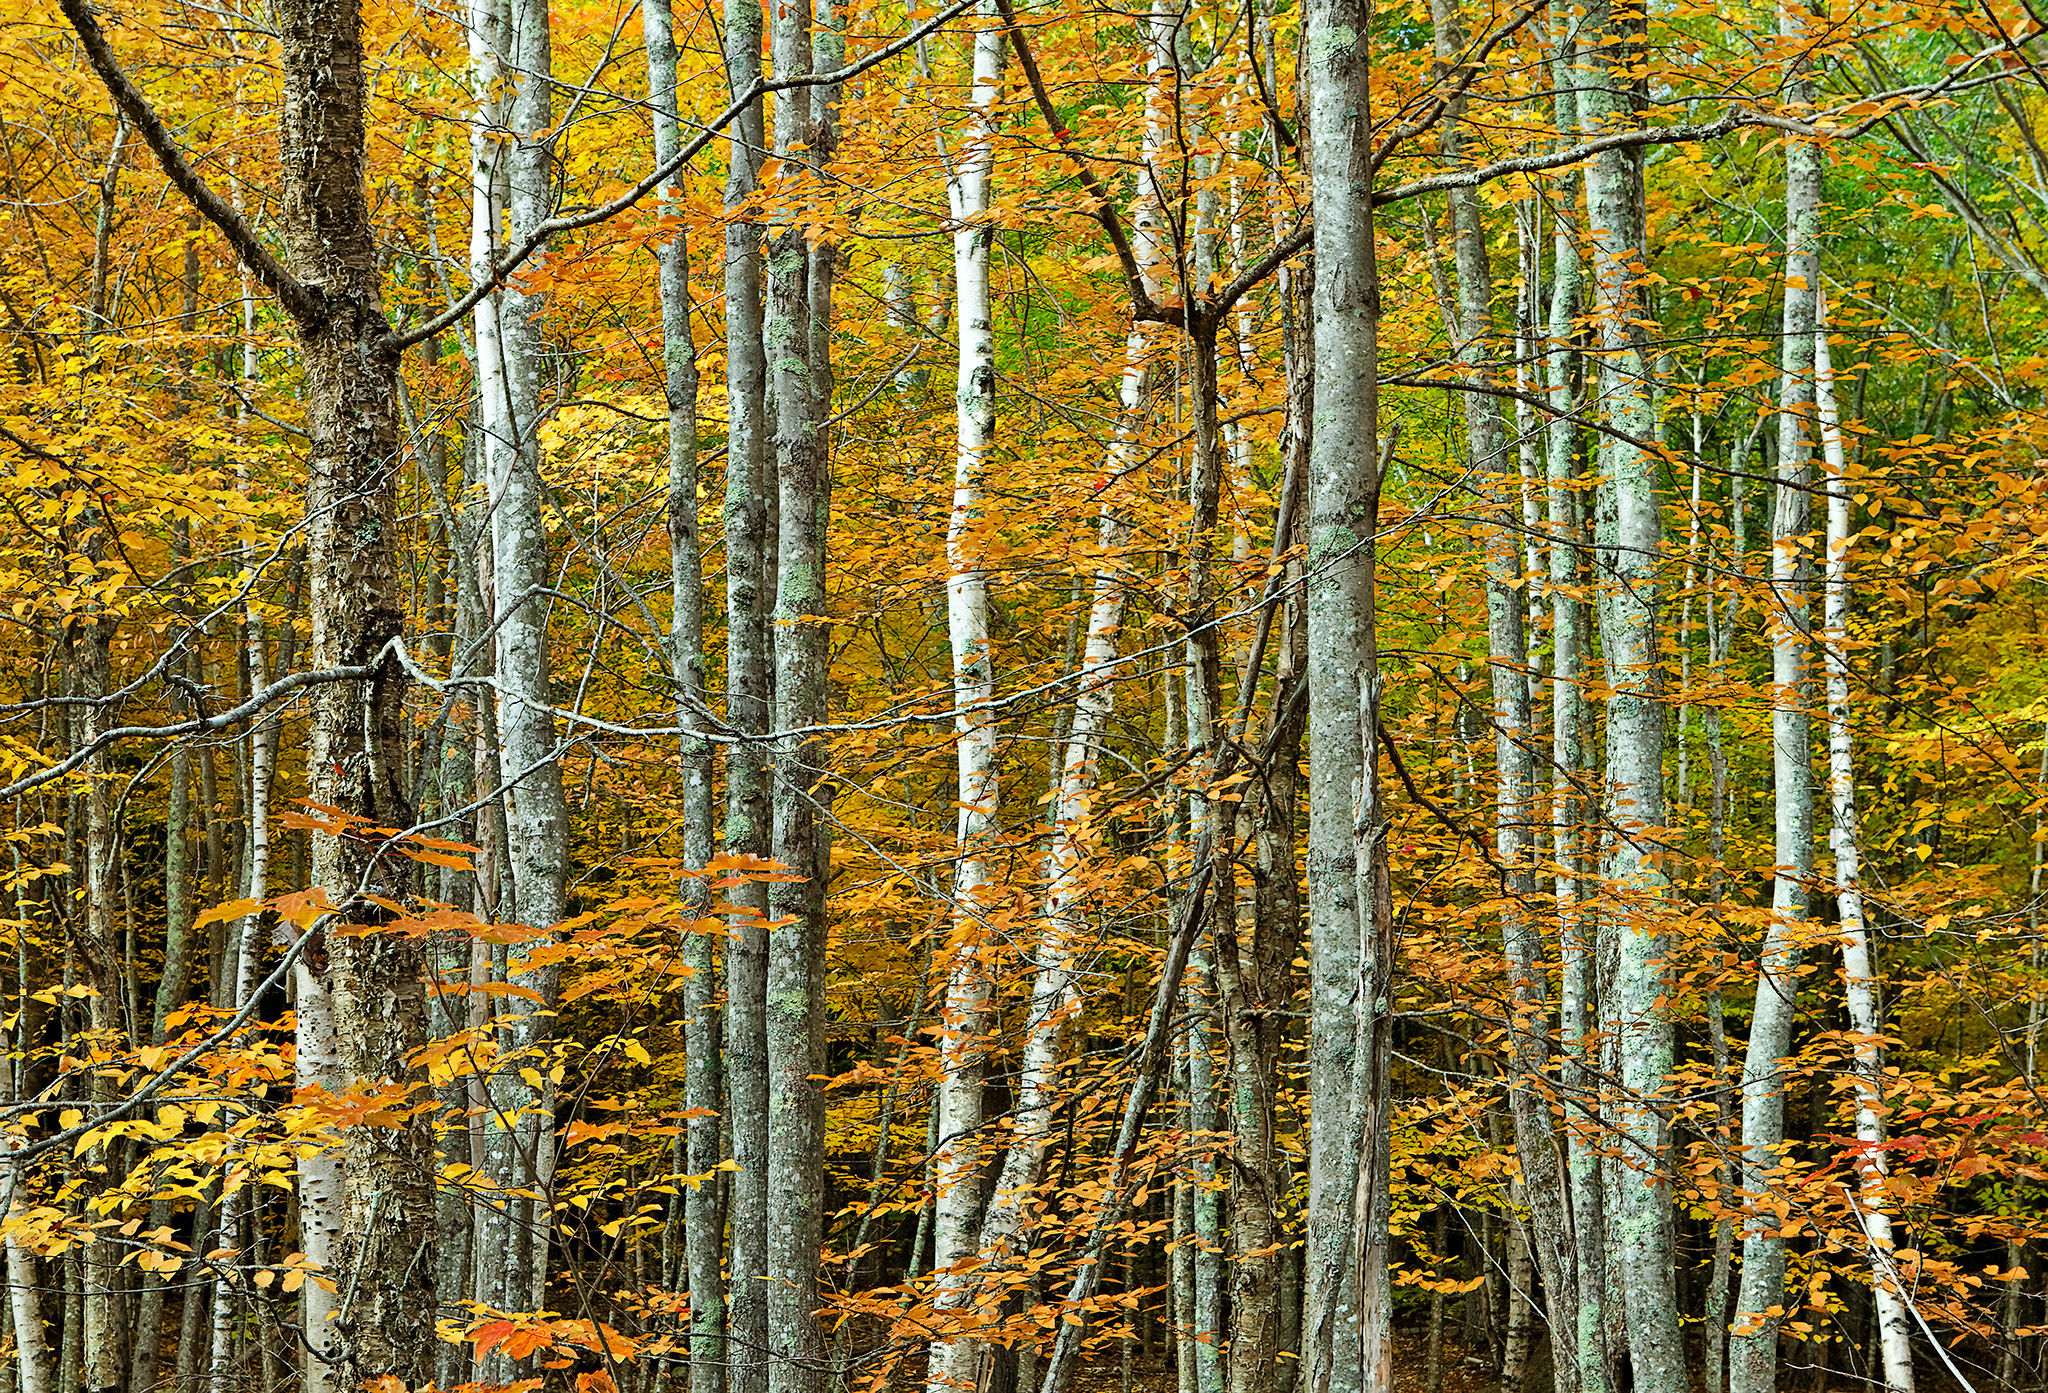 Sieur de Monts Woods